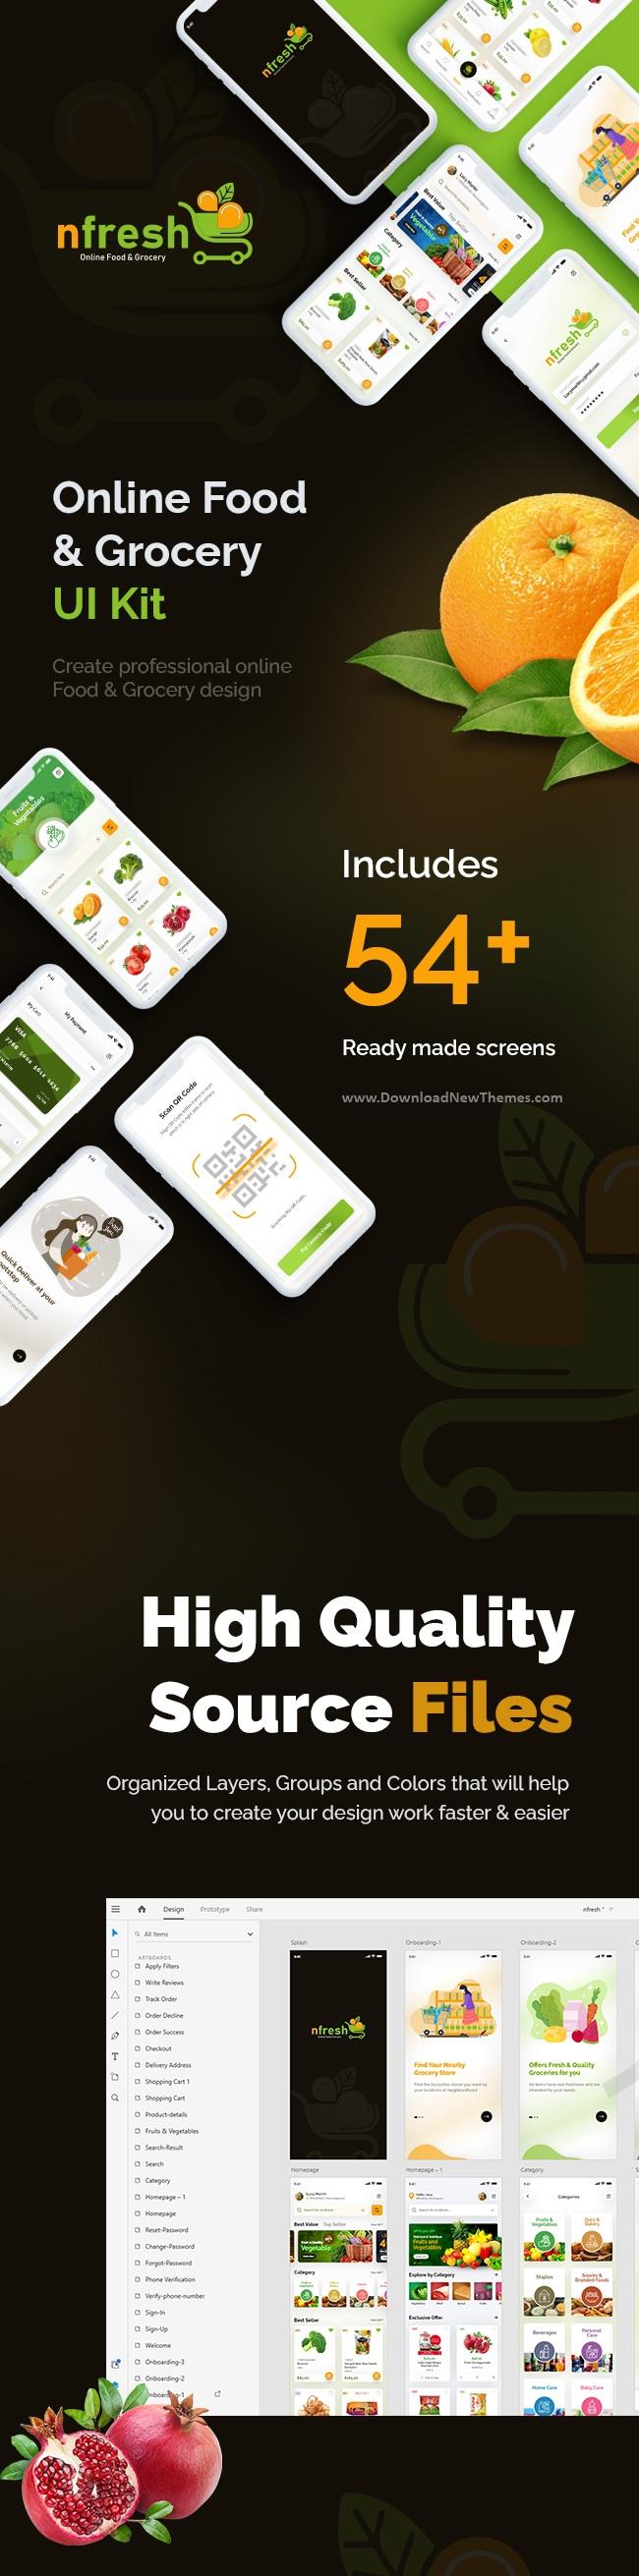 Adobe XD Food and Grocery Mobile App UI Kit